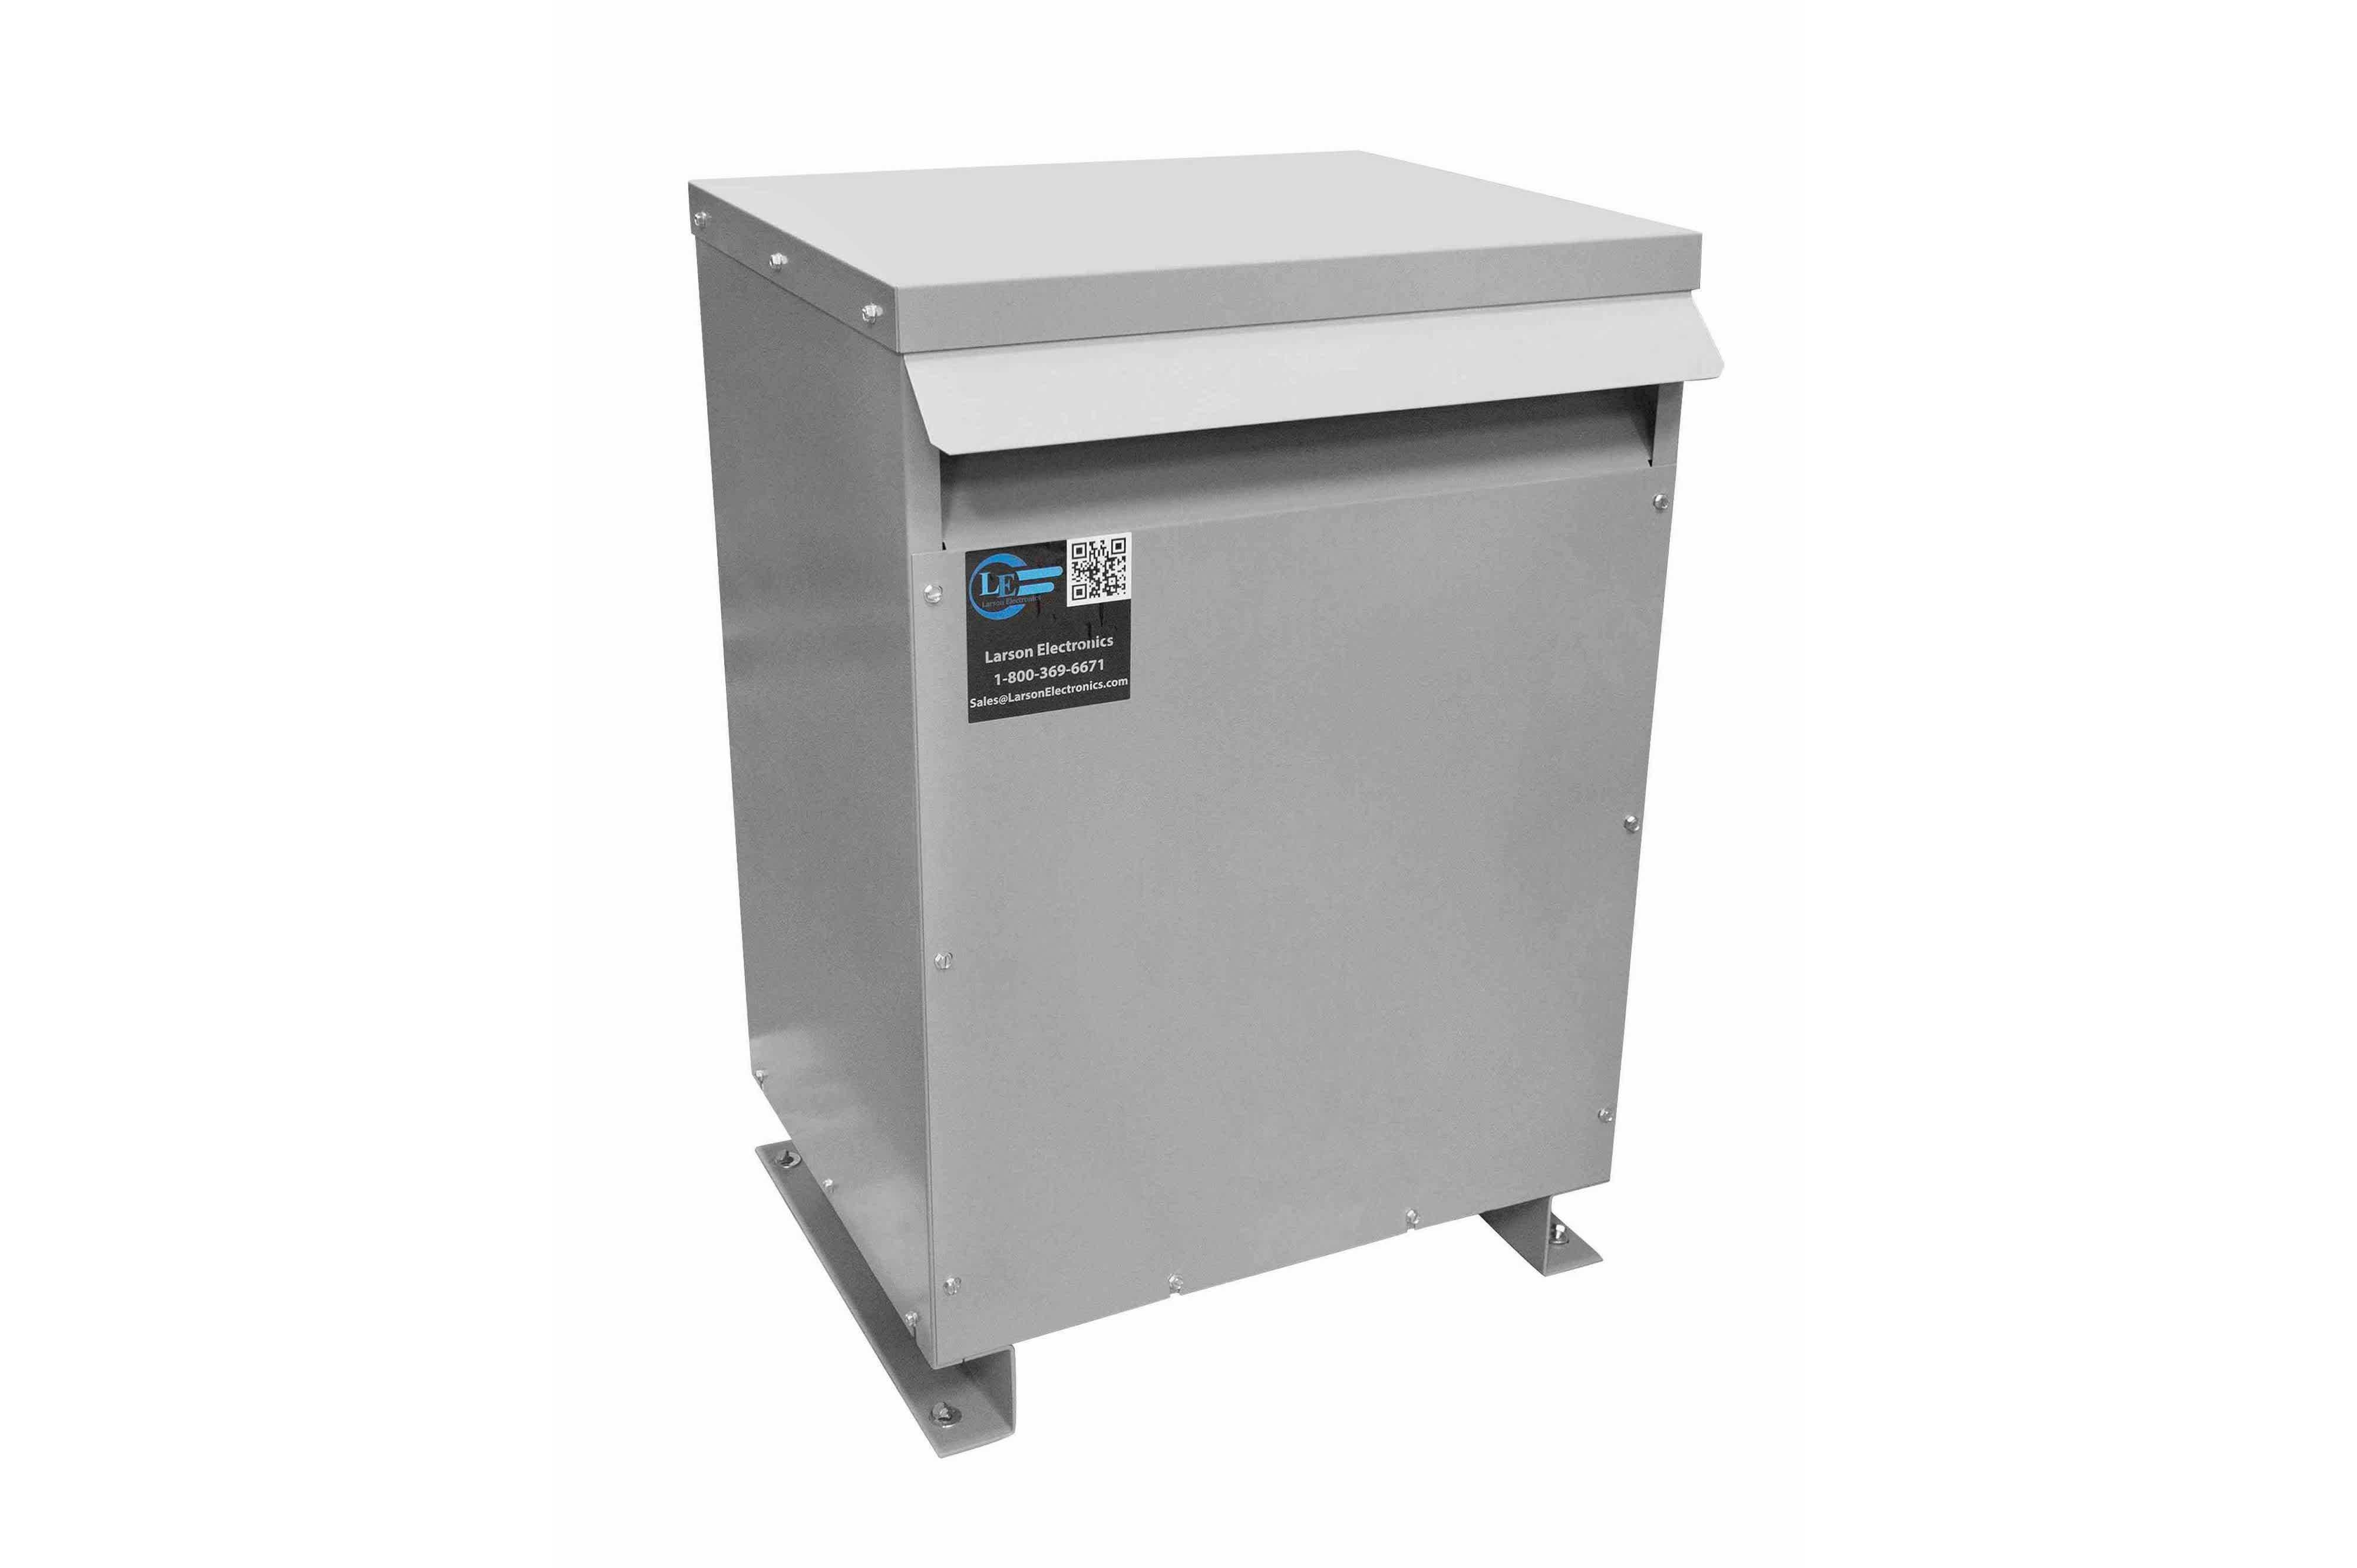 13 kVA 3PH Isolation Transformer, 415V Wye Primary, 480Y/277 Wye-N Secondary, N3R, Ventilated, 60 Hz